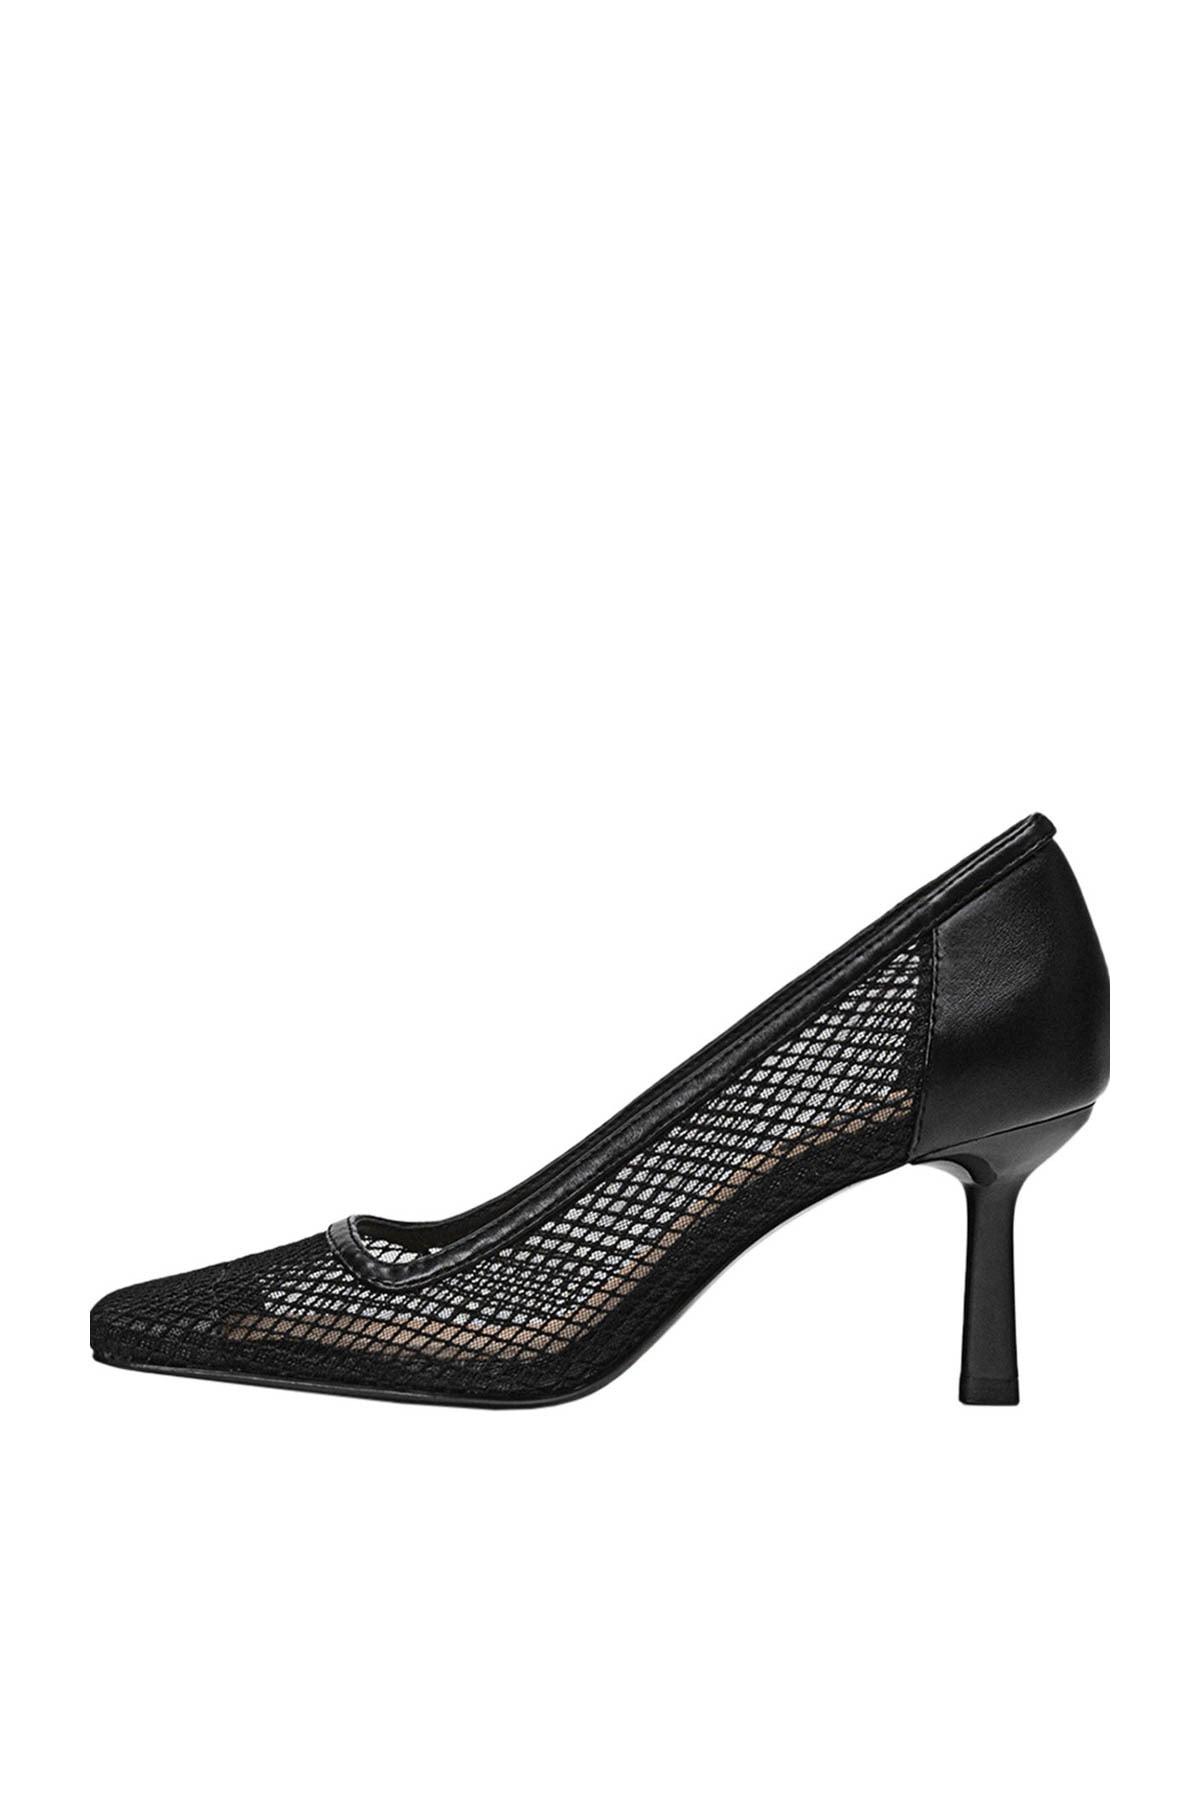 Stradivarius Kadın Siyah Fileli Yüksek Topuklu Ayakkabı 19657670 1